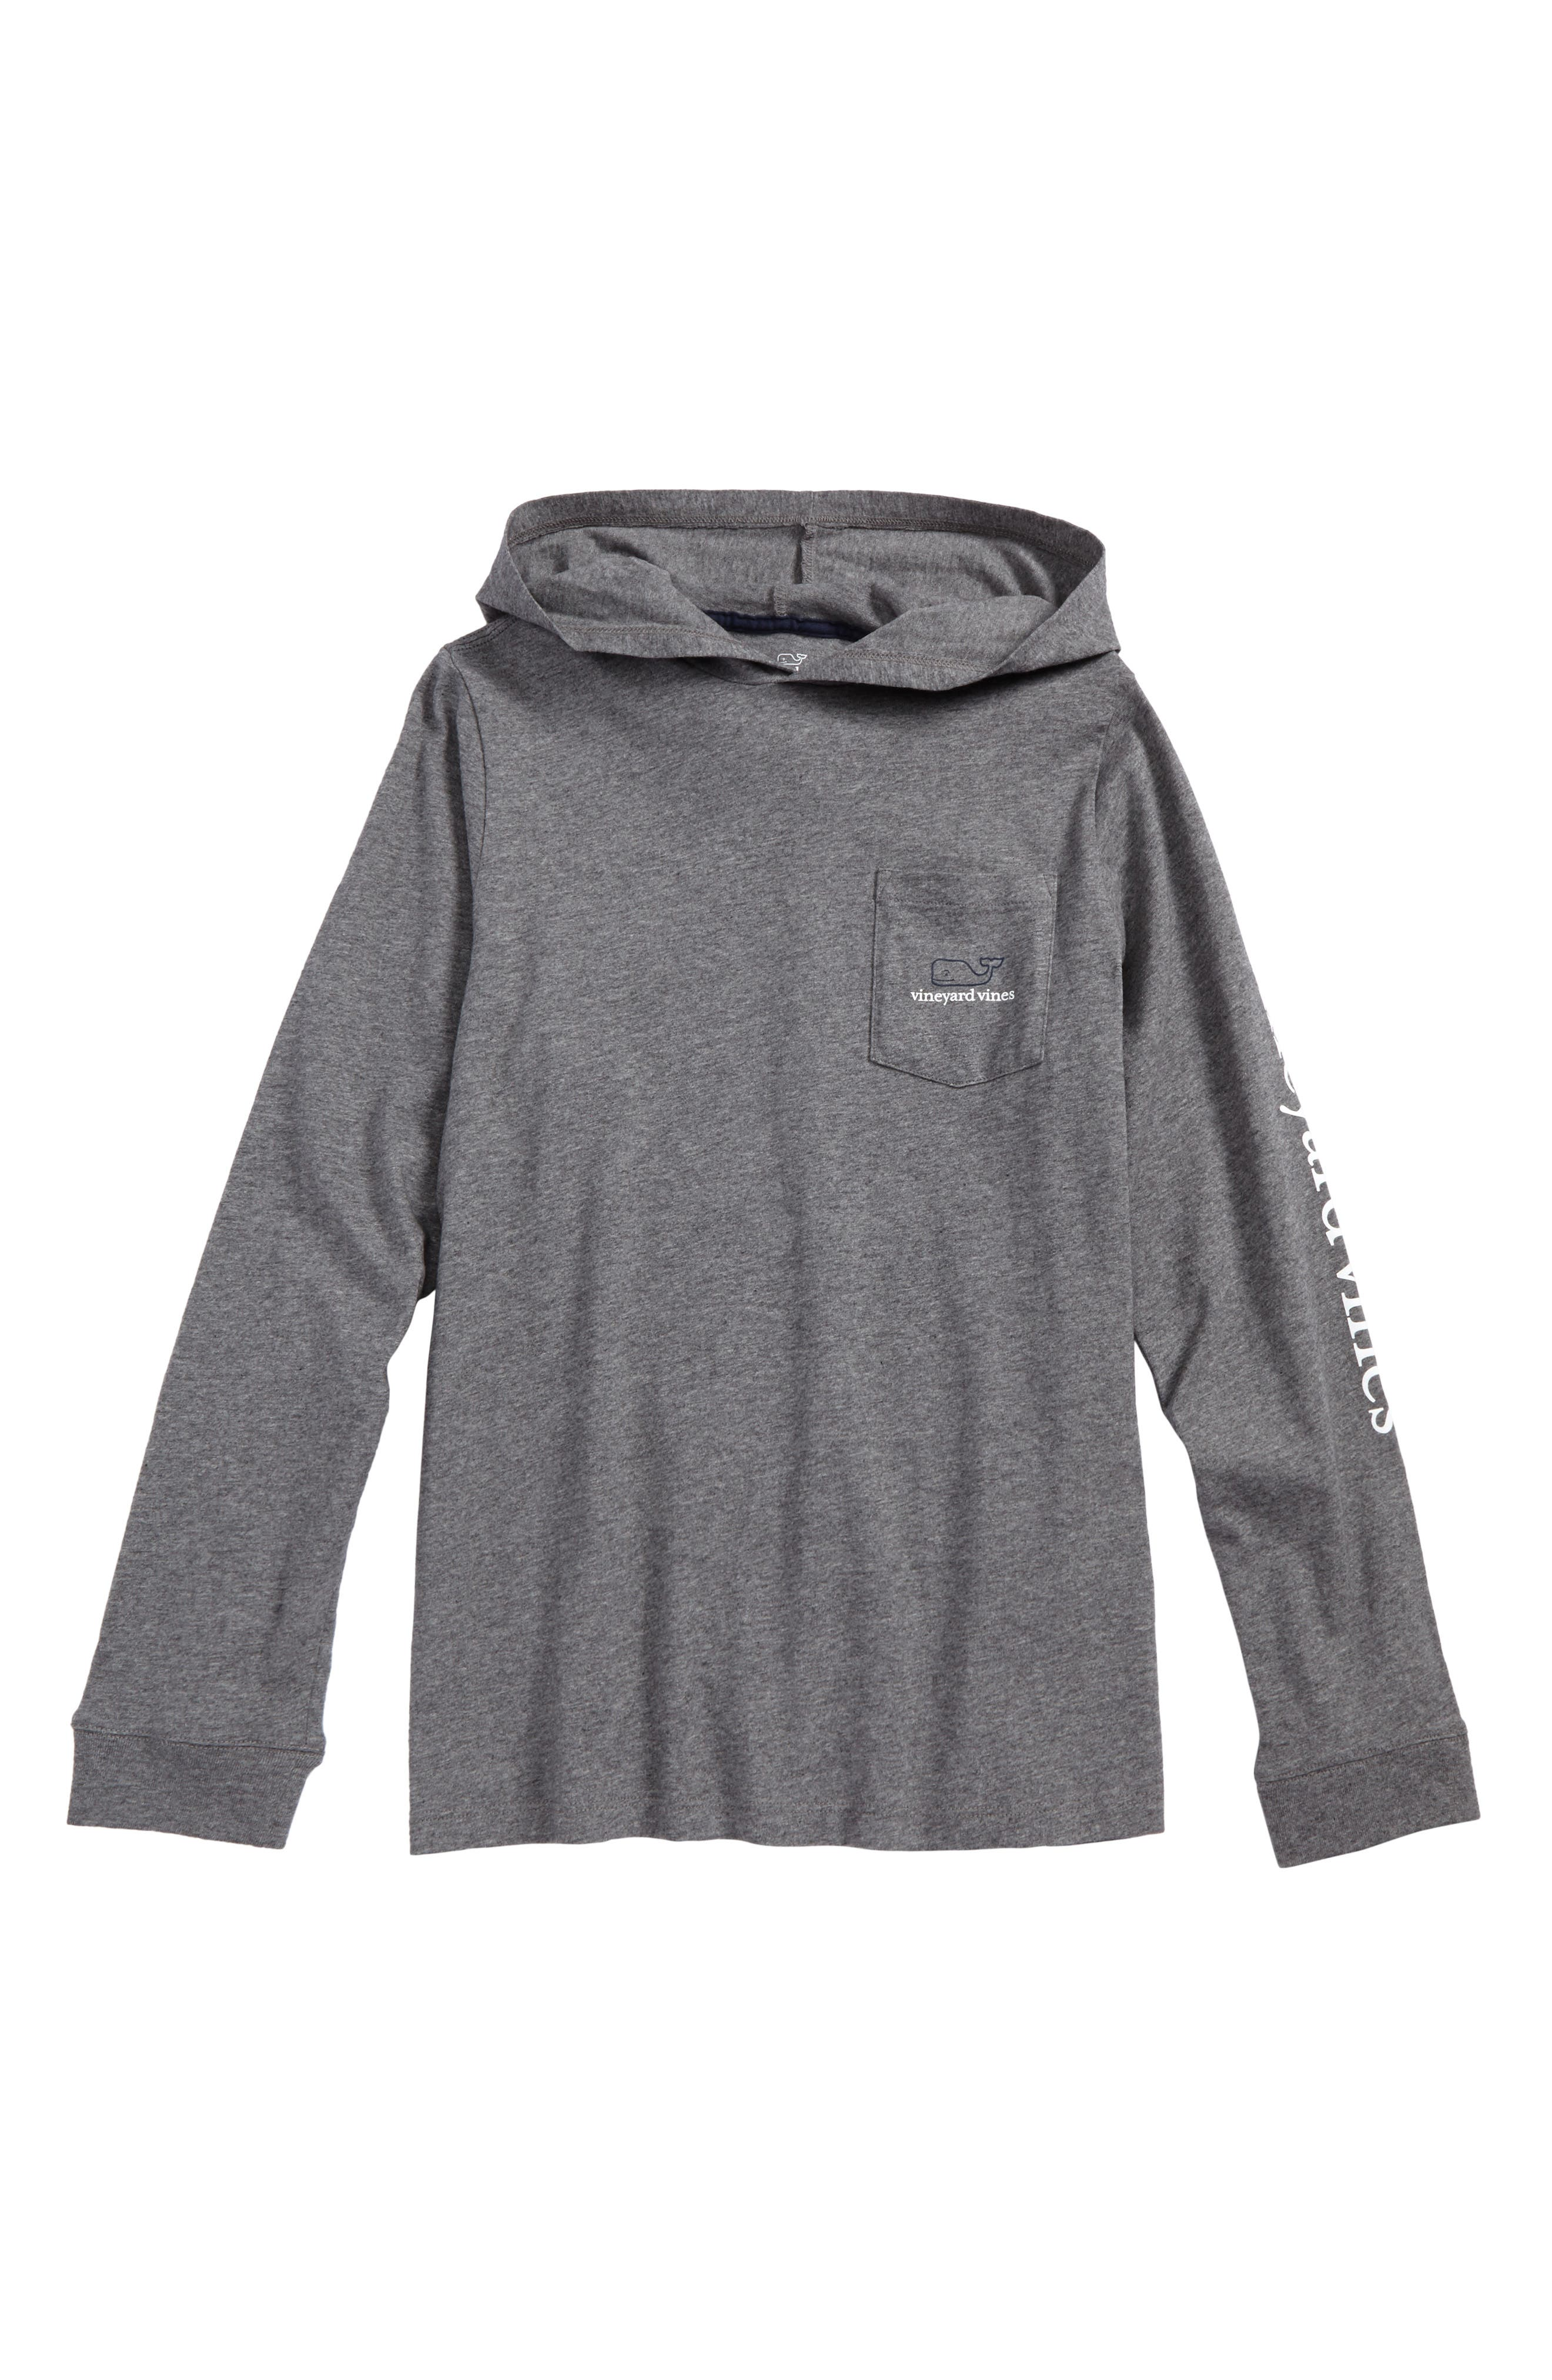 vineyard vines Whale Pocket Hooded T-Shirt (Big Boys)